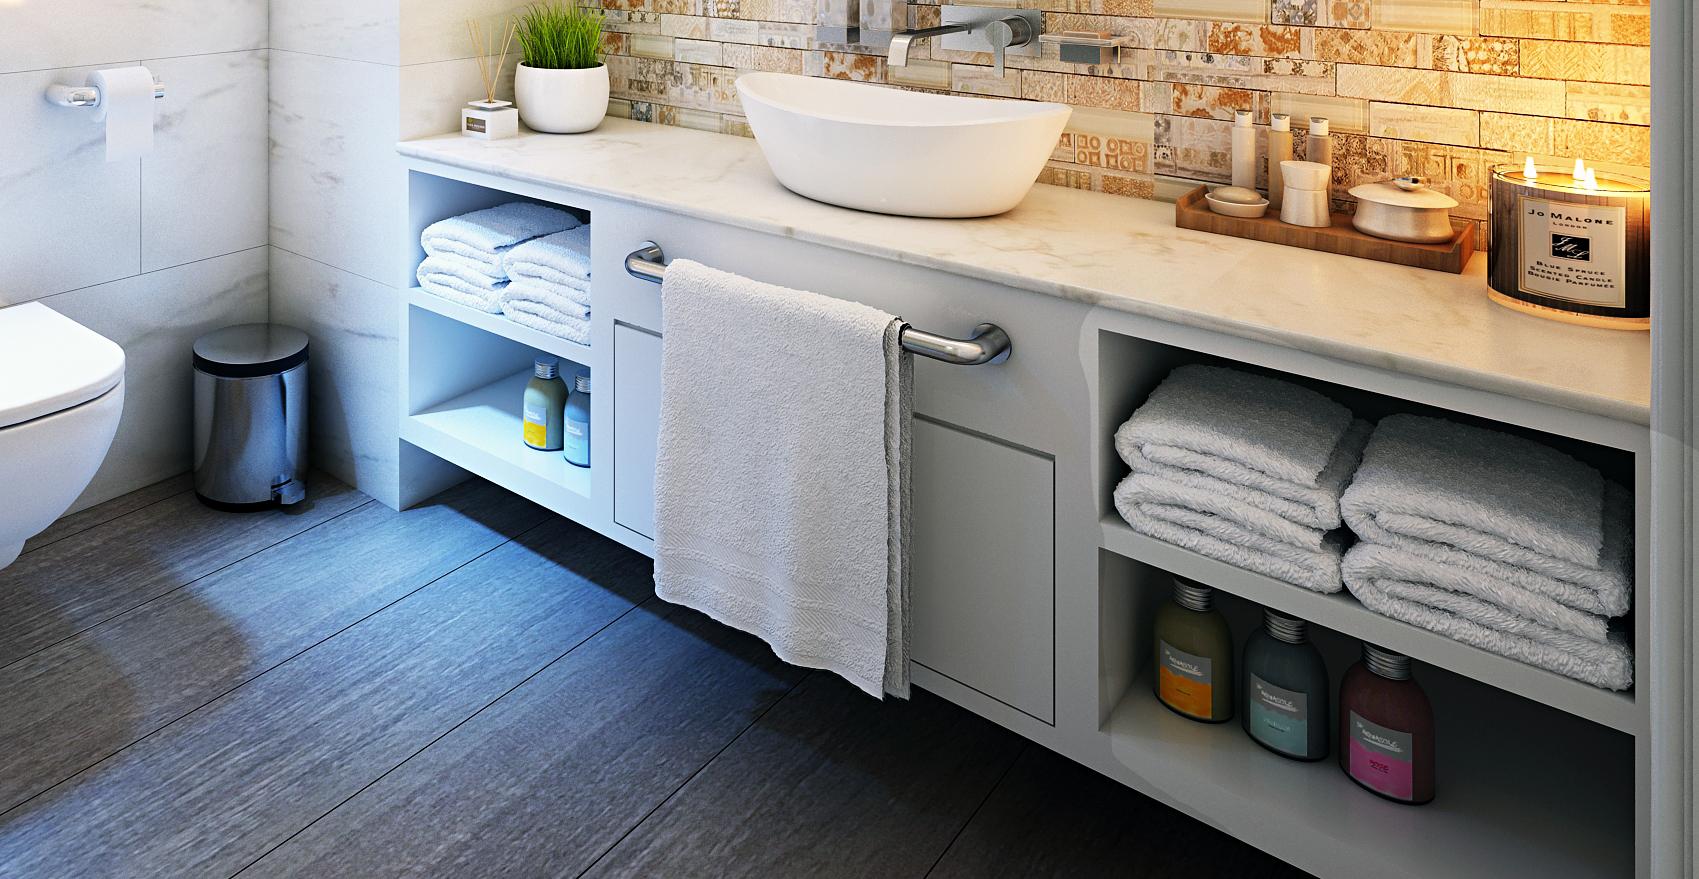 ask wet forget 3 inventive diy bathroom storage ideas for small bathrooms ask wet forget. Black Bedroom Furniture Sets. Home Design Ideas